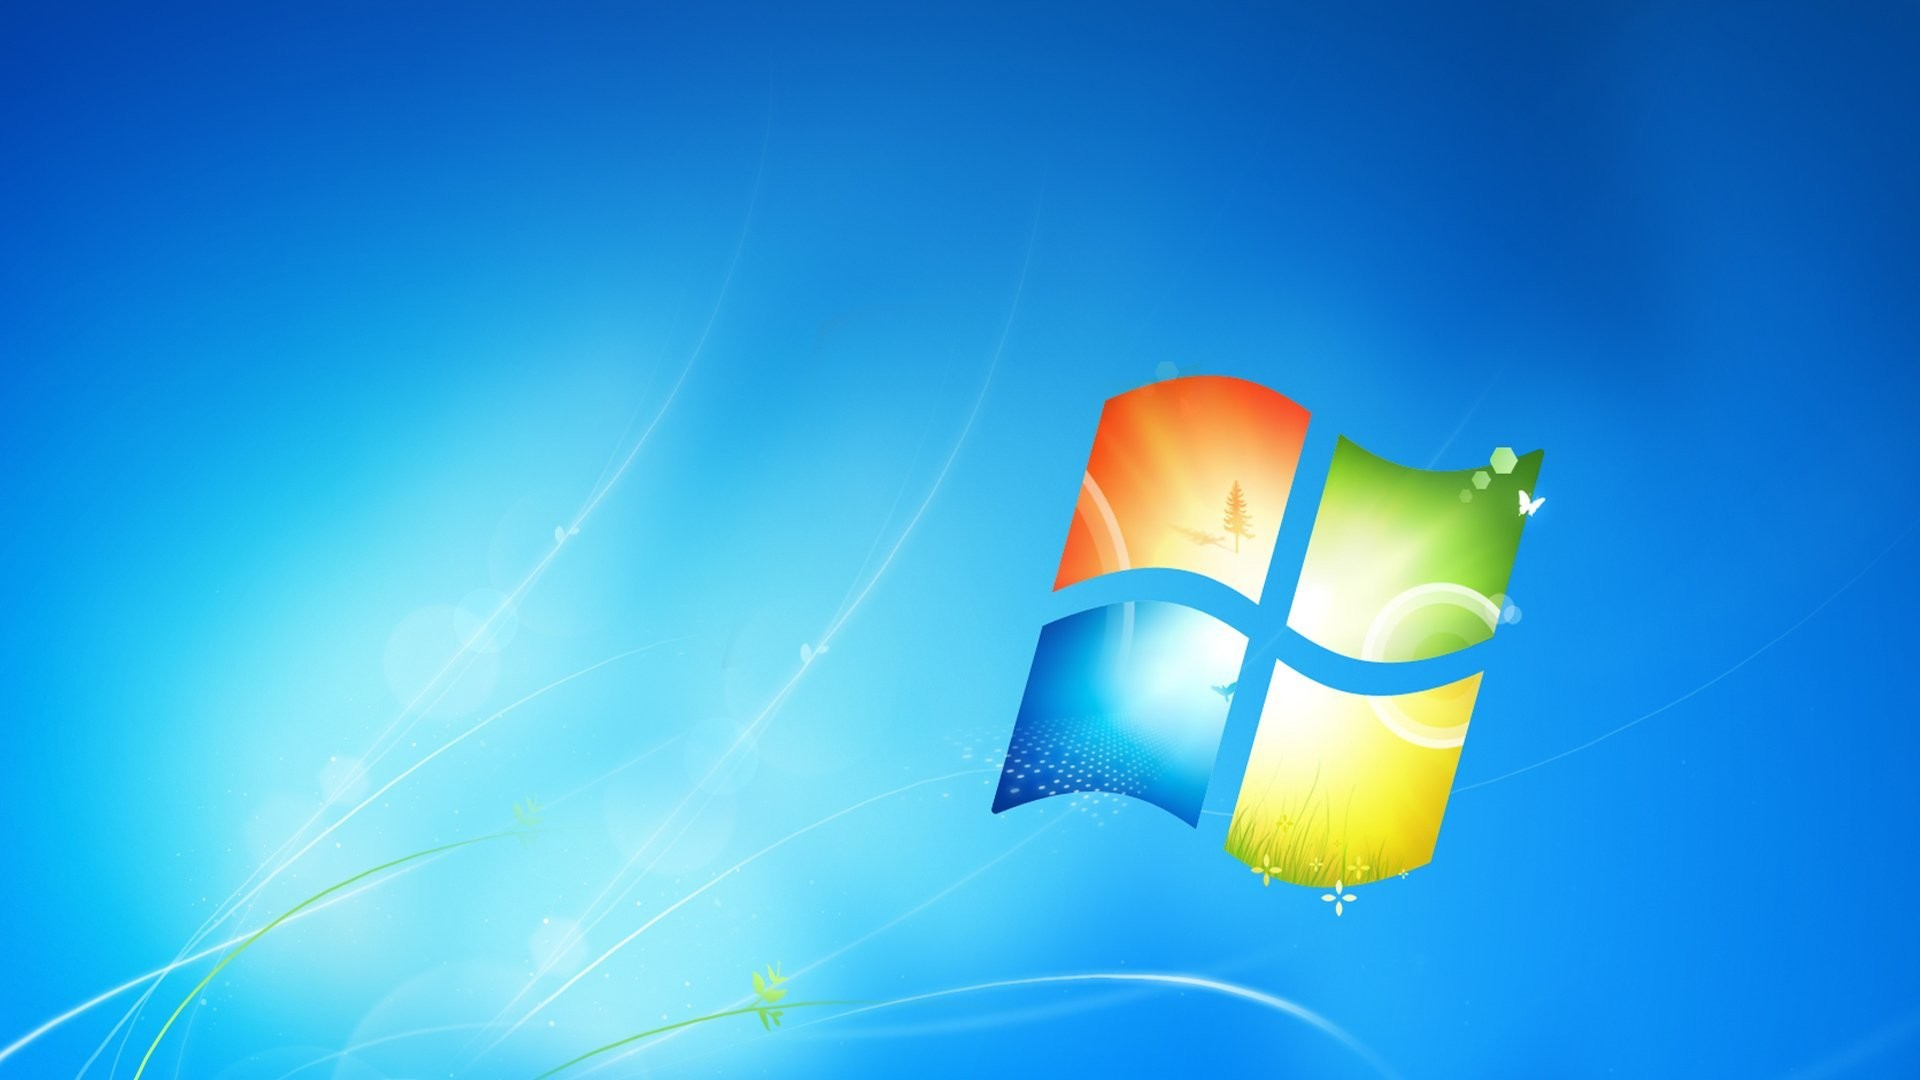 Full Hd Windows 7 Wallpaper 1920×1080